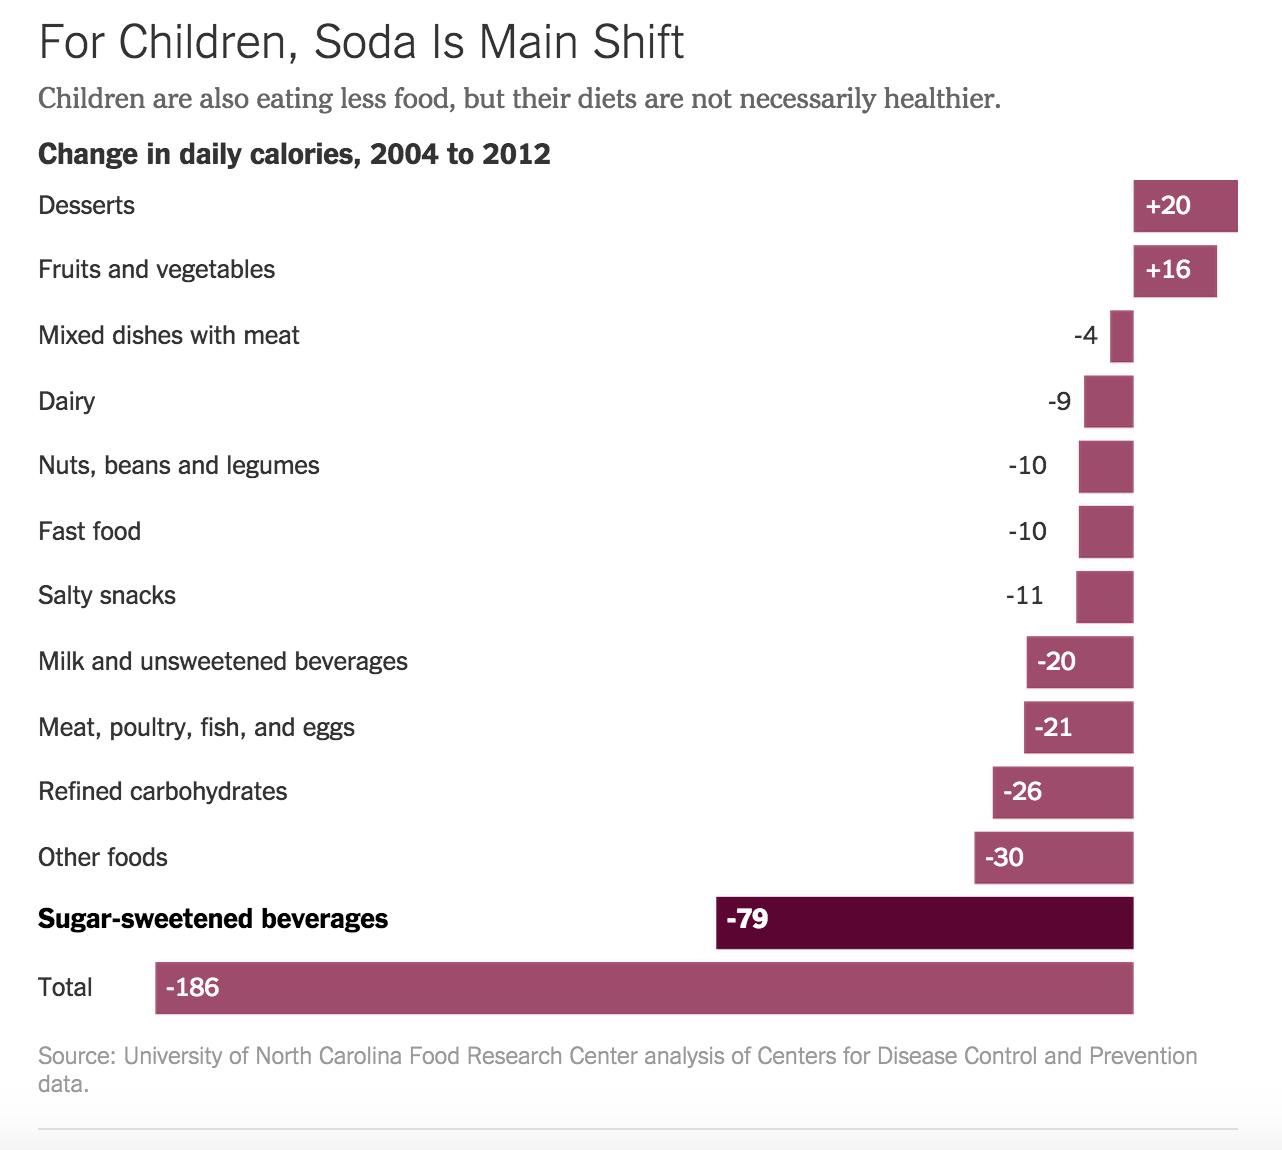 coke children